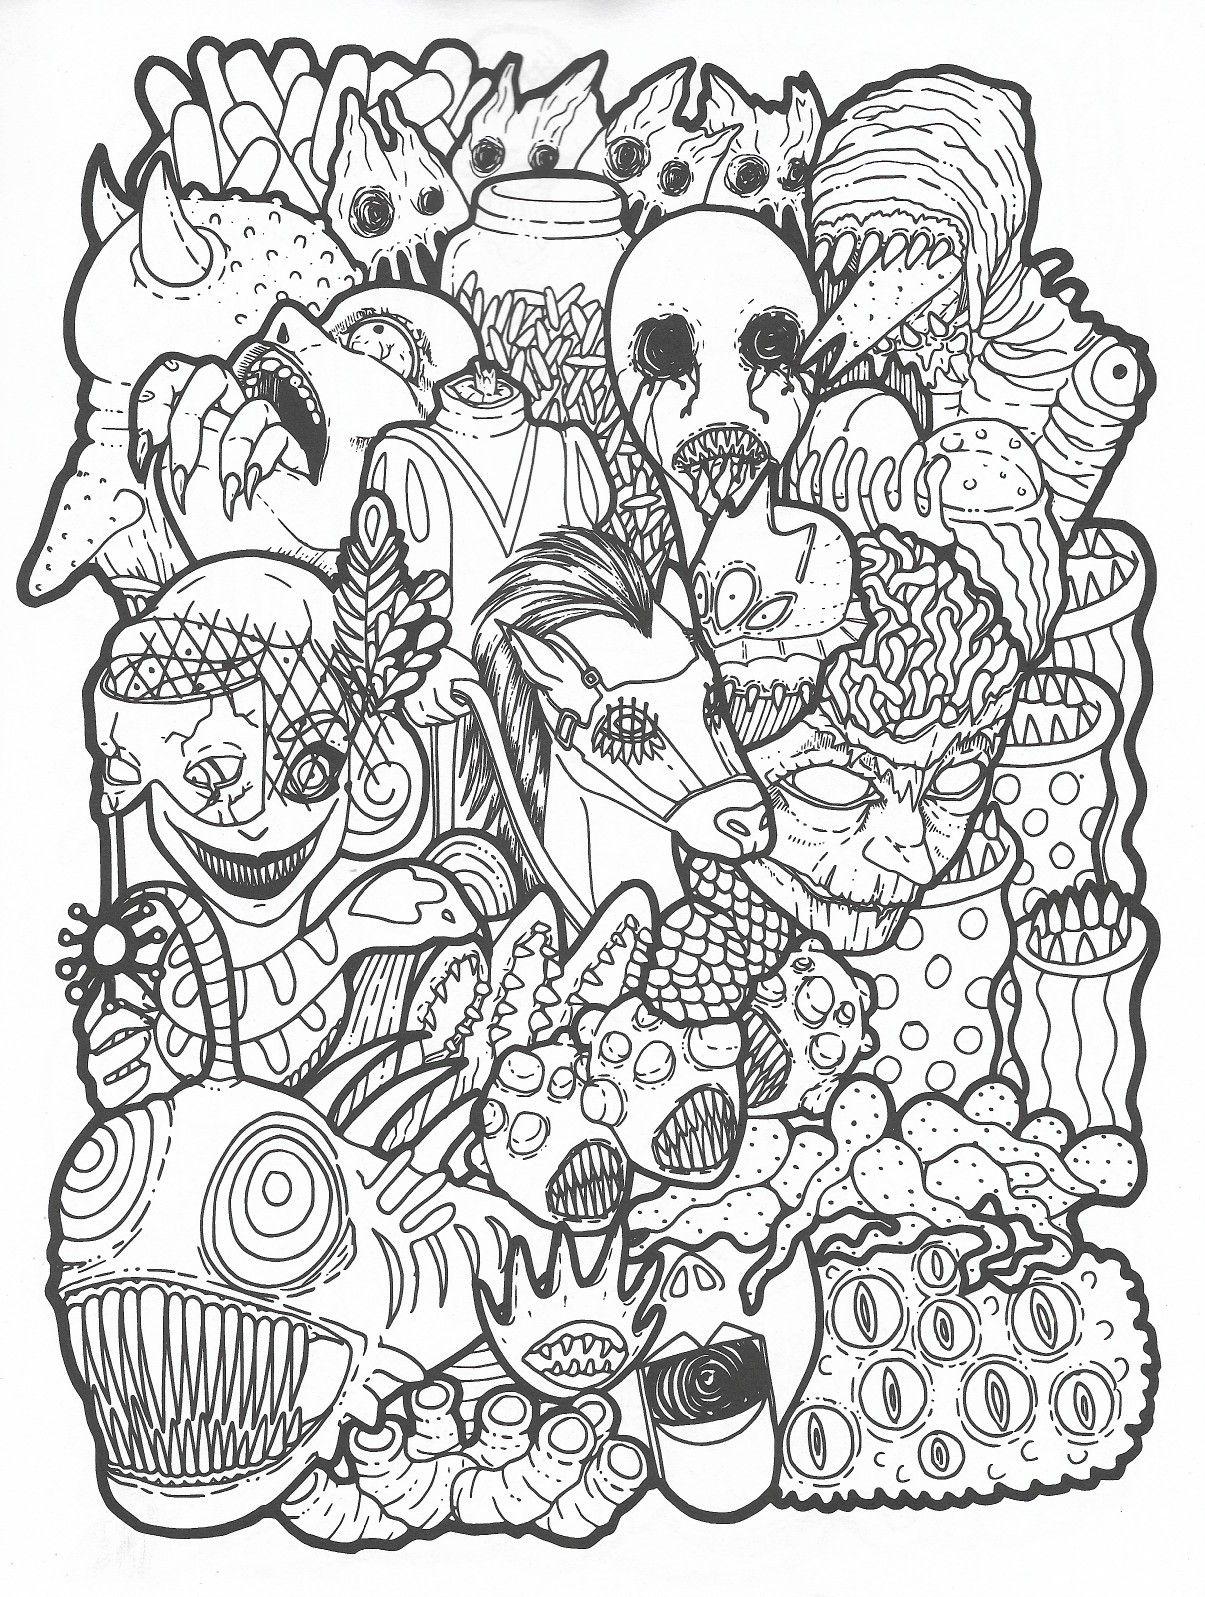 Badass Coloring Pages : badass, coloring, pages, Badass, Coloring, Pages